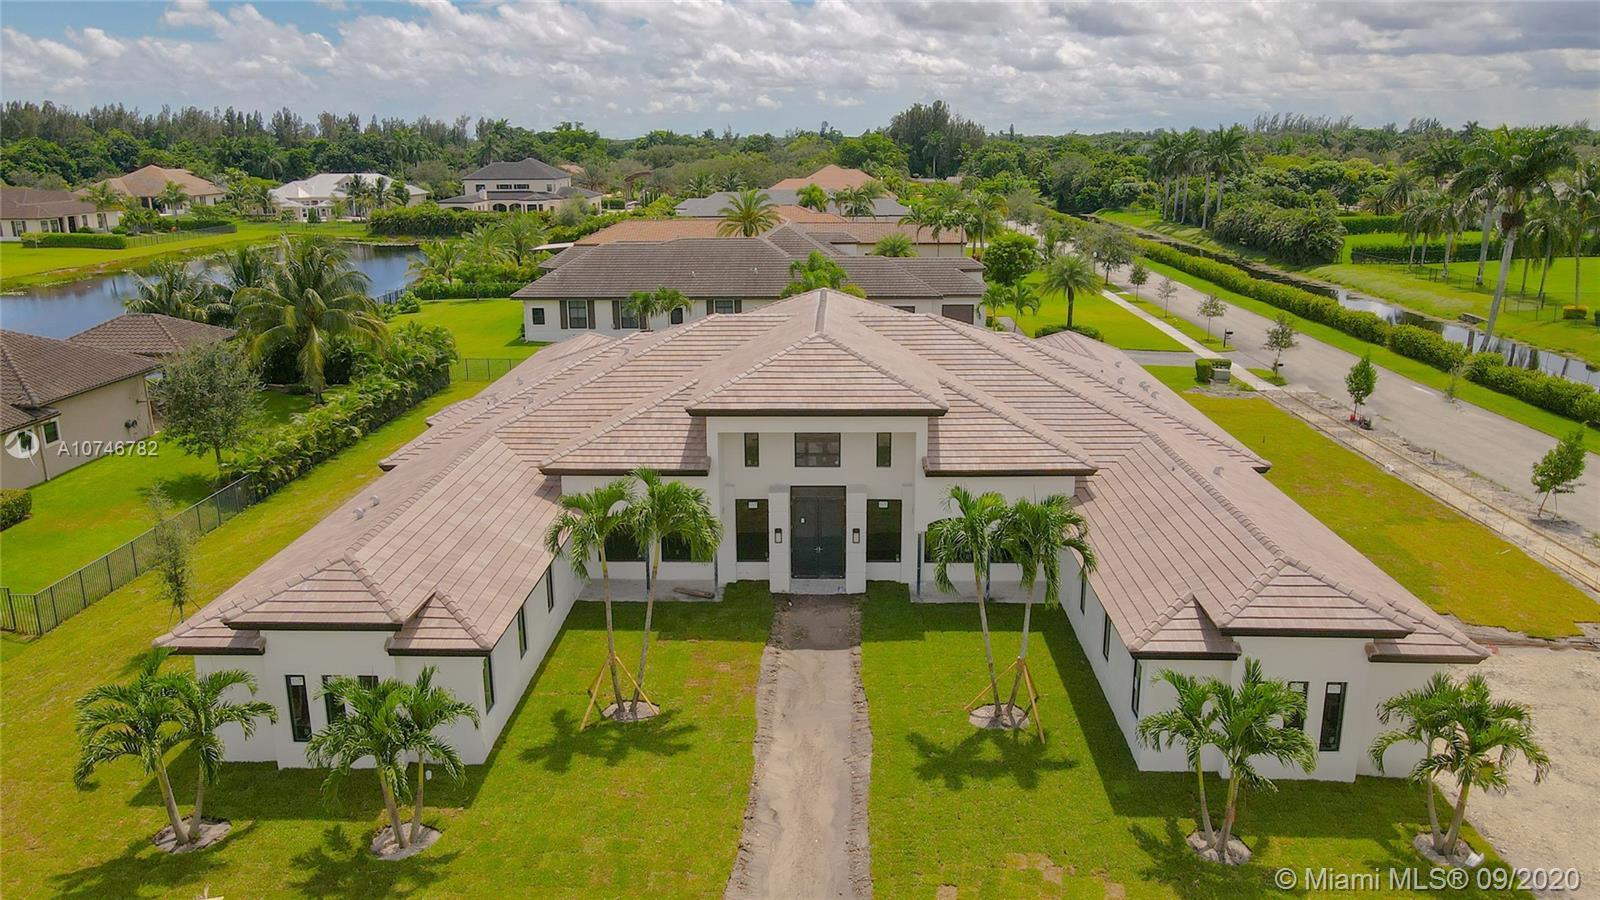 image #1 of property, P J Estates